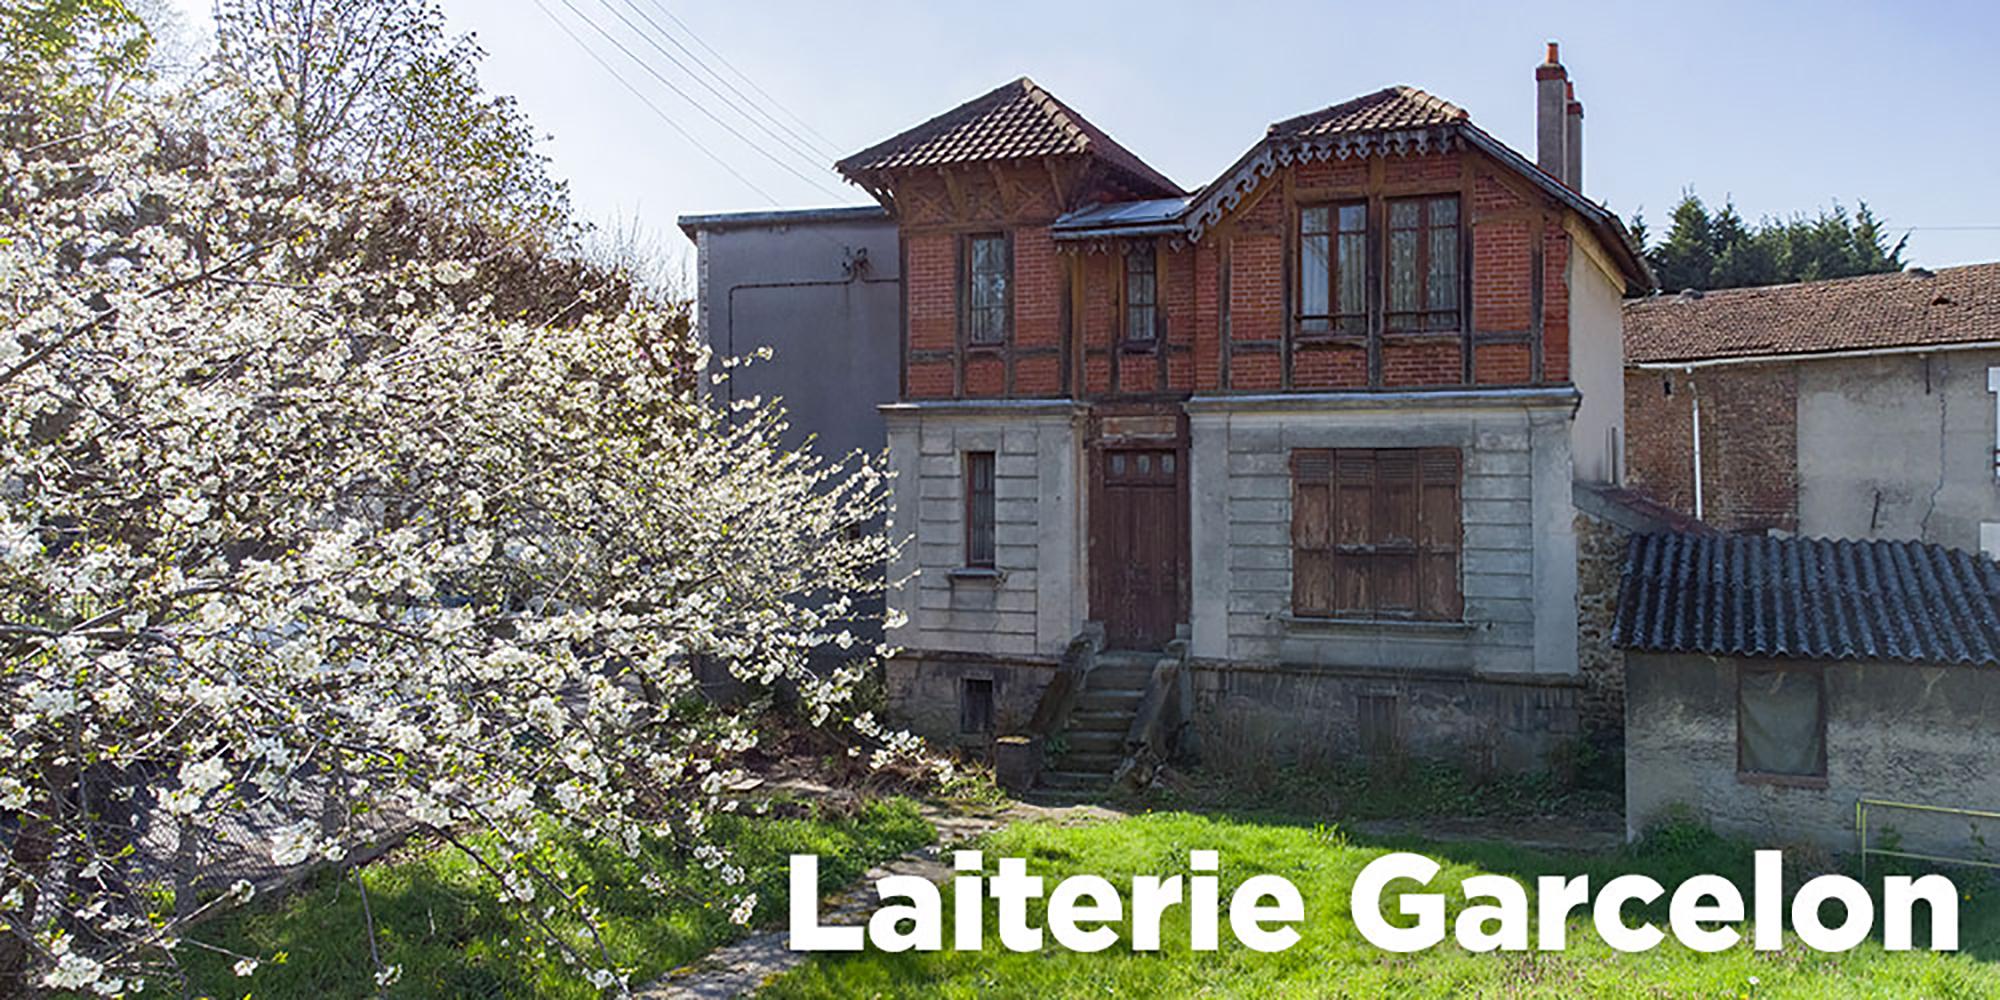 Laiterie Garcelon